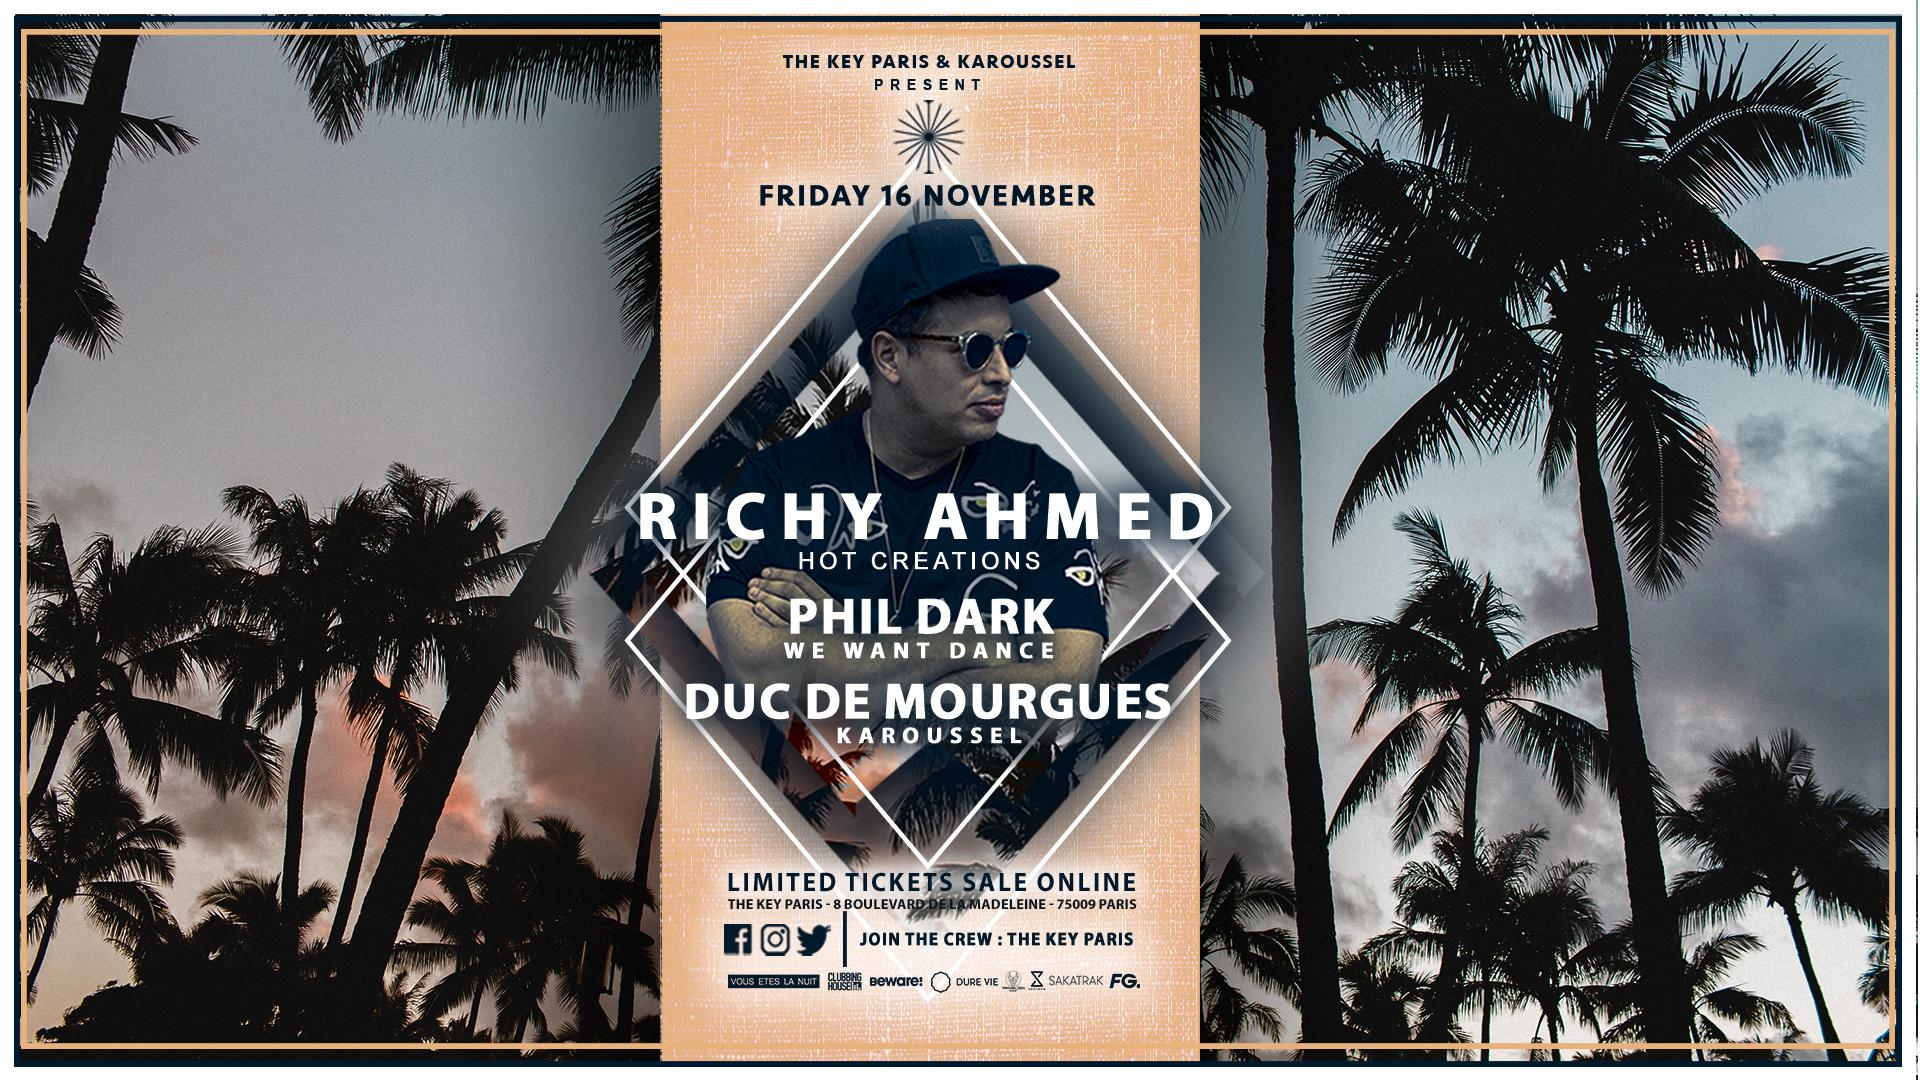 The Key x Karoussel : Richy Ahmed - Phil Dark - Duc de Mourgues